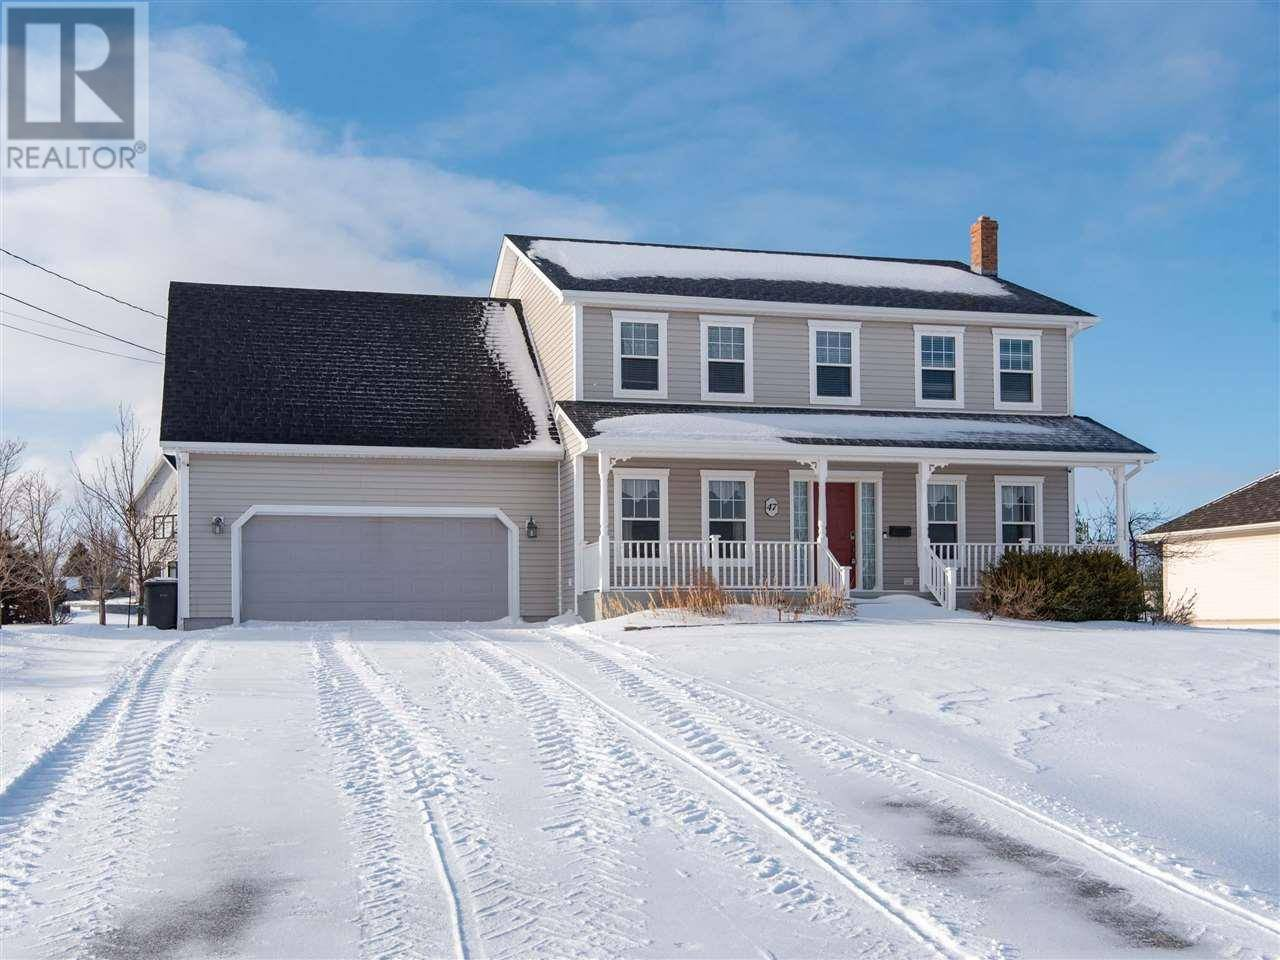 House for sale at 47 Brandy Ln Stratford Prince Edward Island - MLS: 202001932